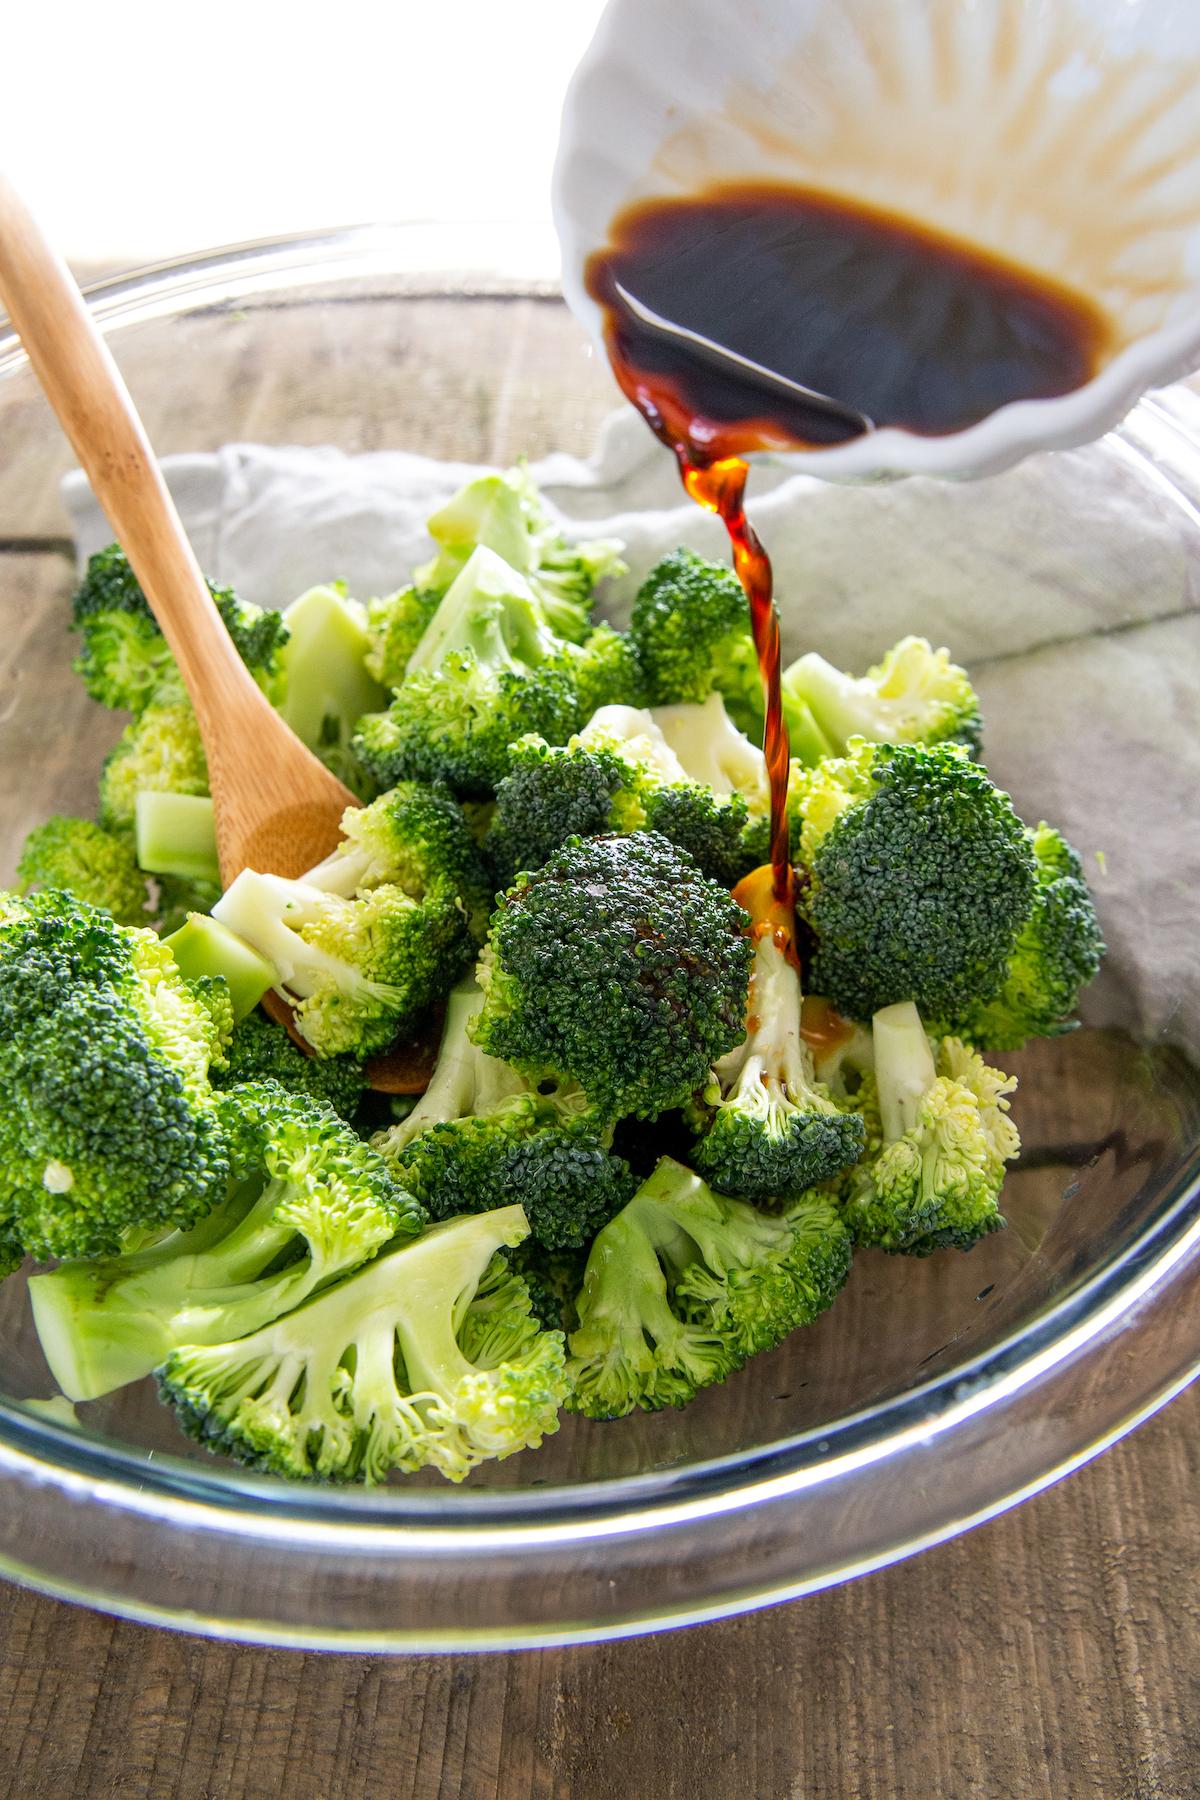 Seasoning mixture poured over broccoli florets.